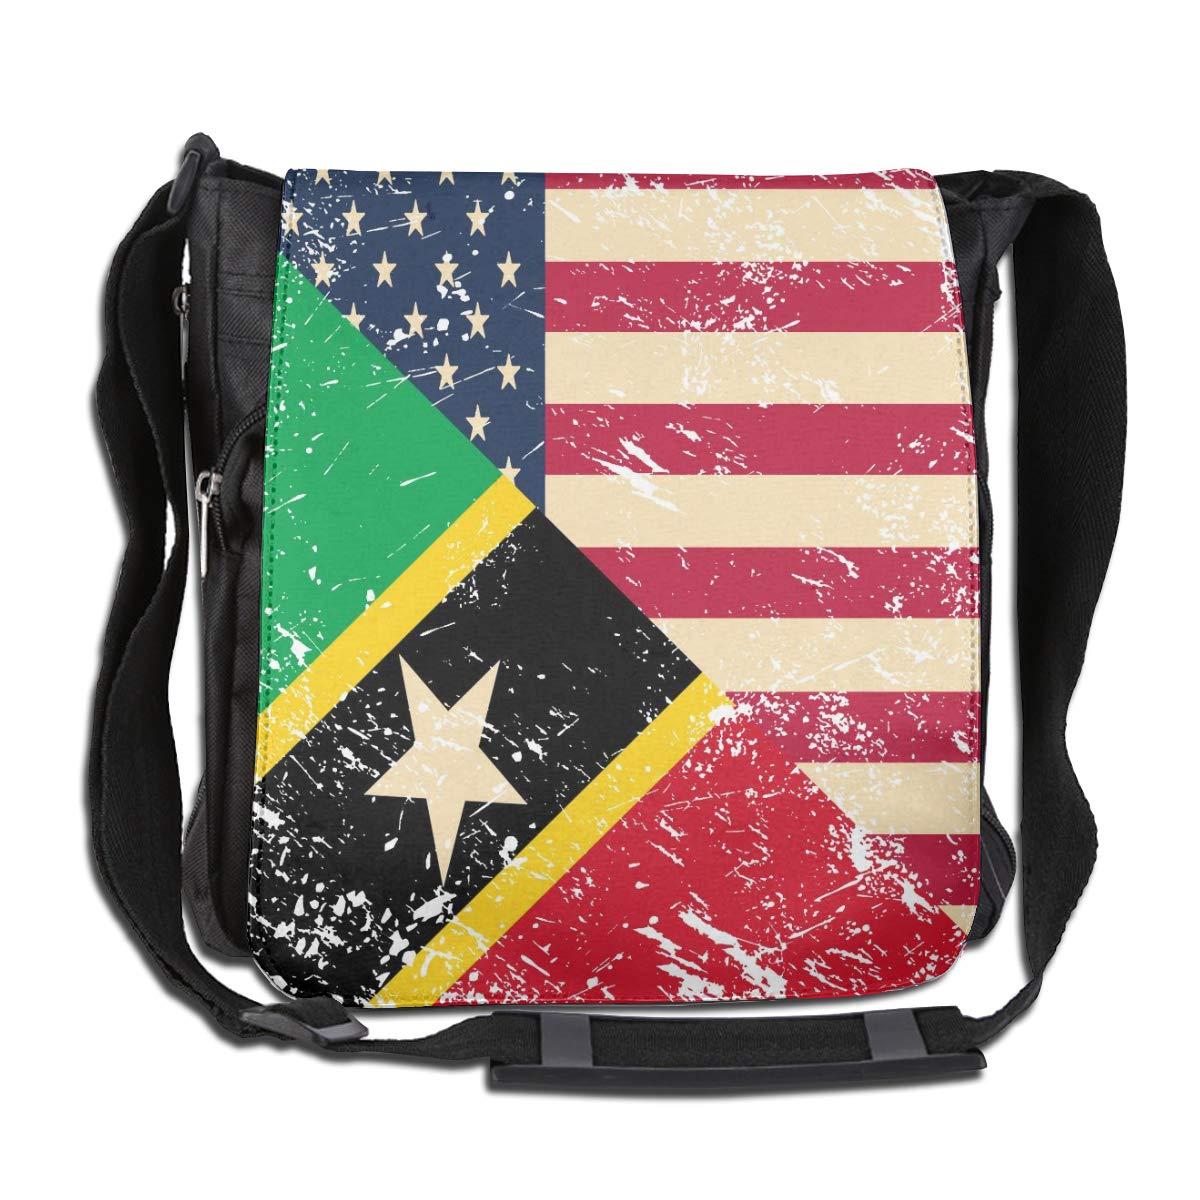 Unisex Fashion Satchel Messenger Bags American And Nevis Retro Flag2 Crossbody Shoulder Bag Traveling Bag For School//Work//Trips